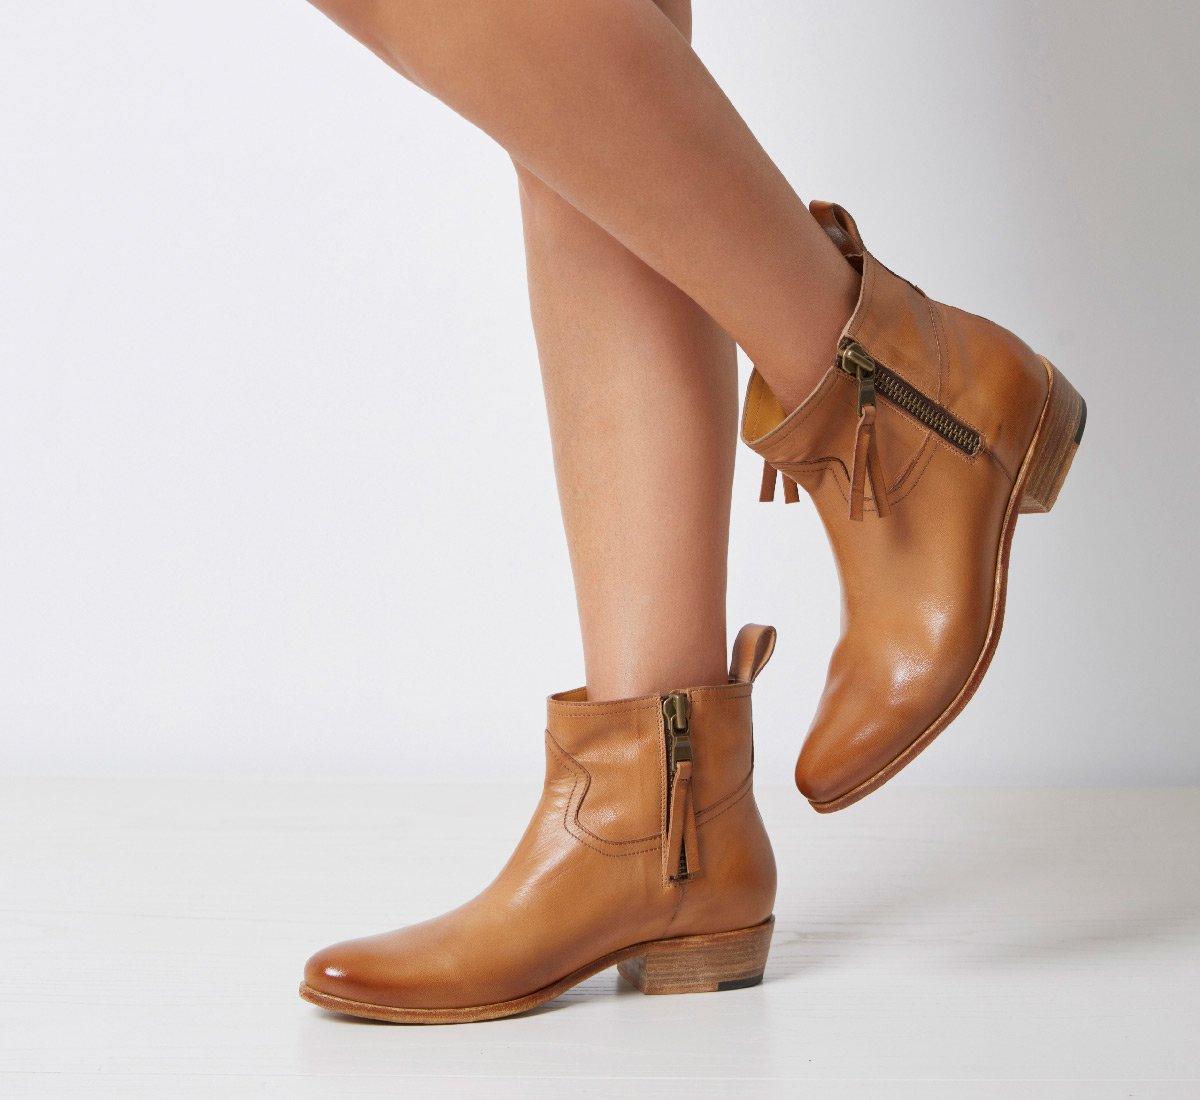 Barracuda cowboy boots in vegetable nappa